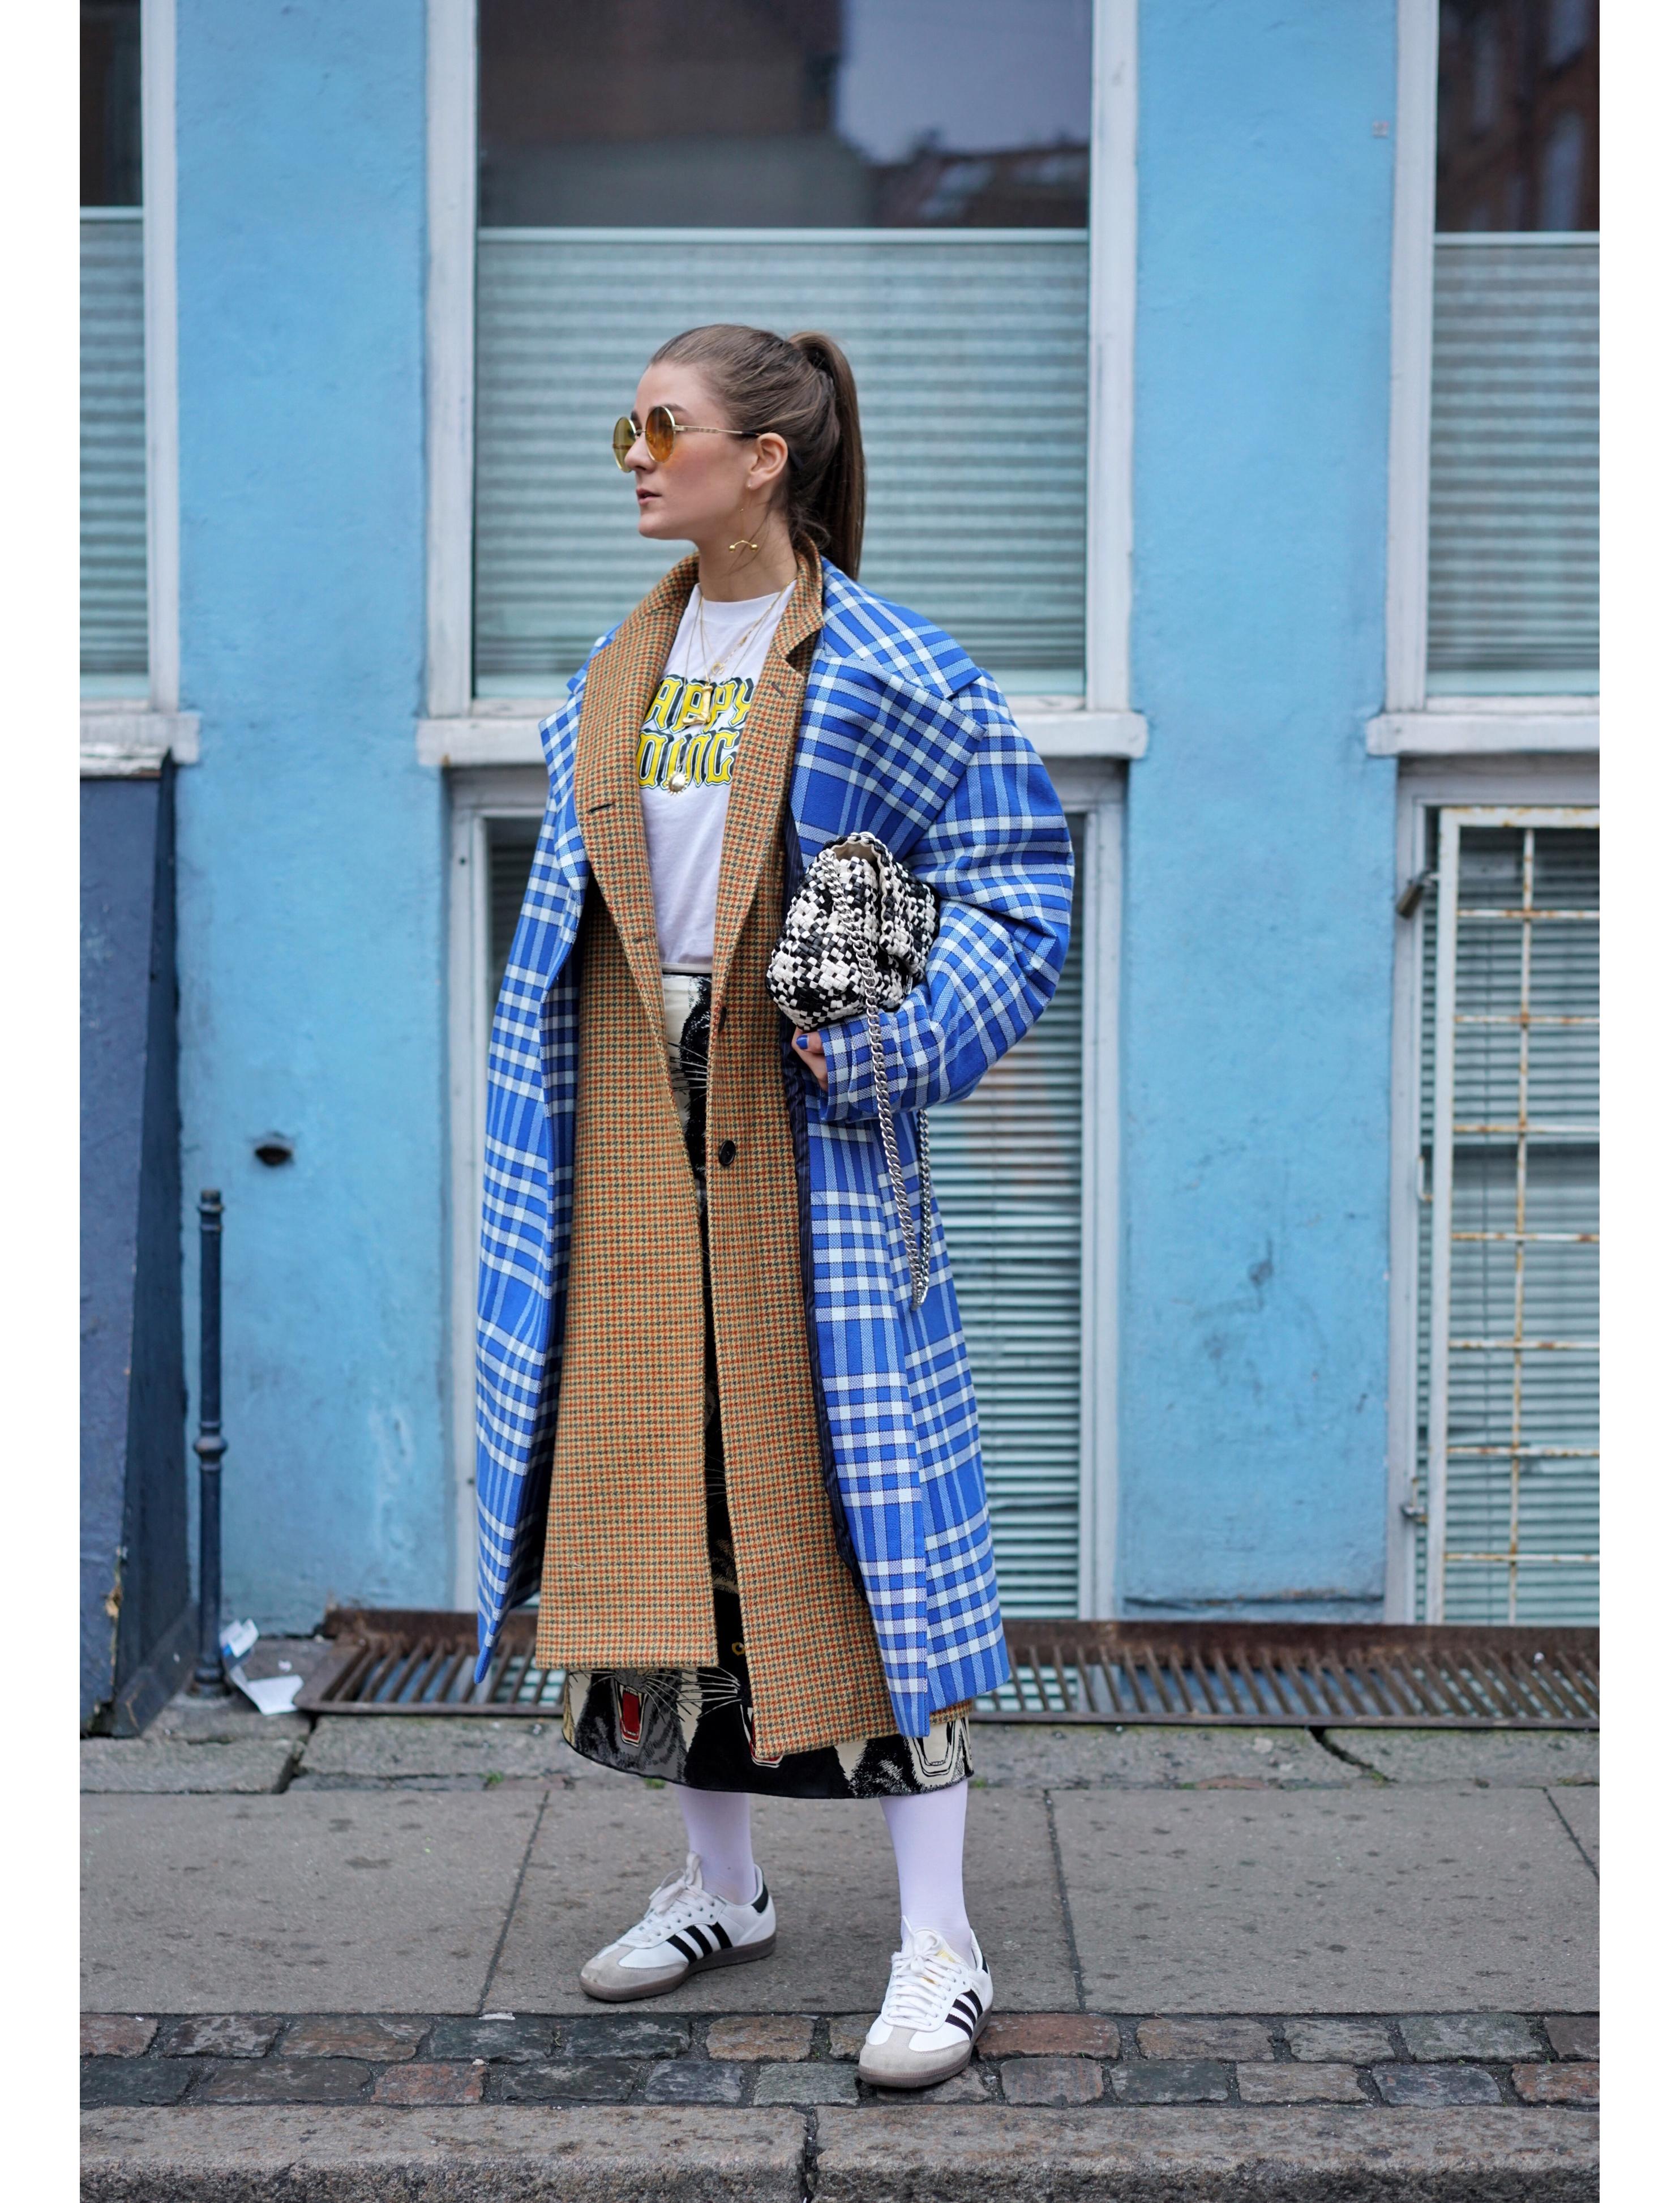 Linn-eklund-blogg-elle-cphfw-copenhagen-fashionweek-streetstyle